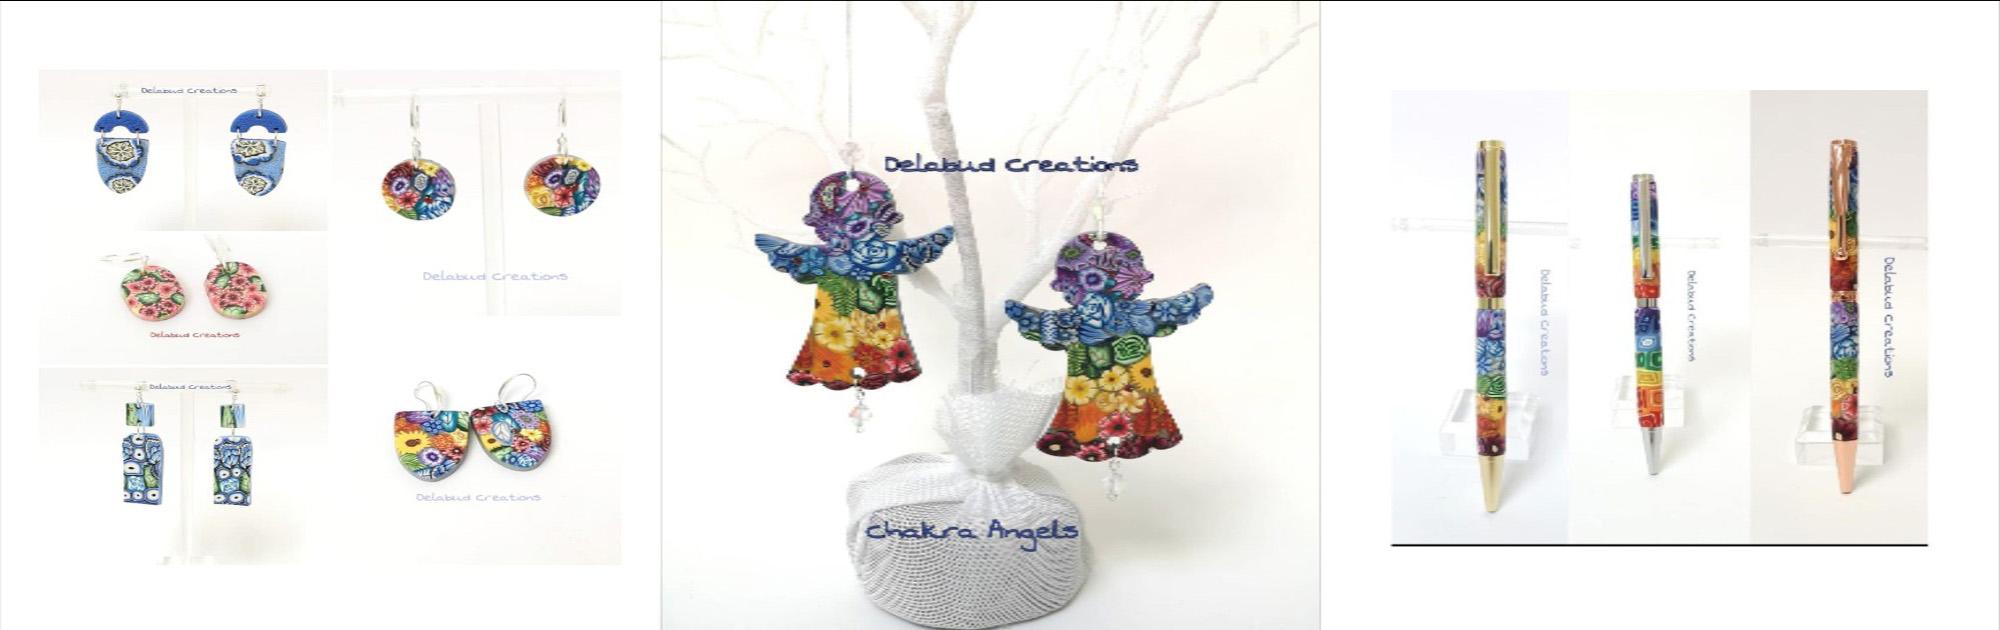 Delabud Creations